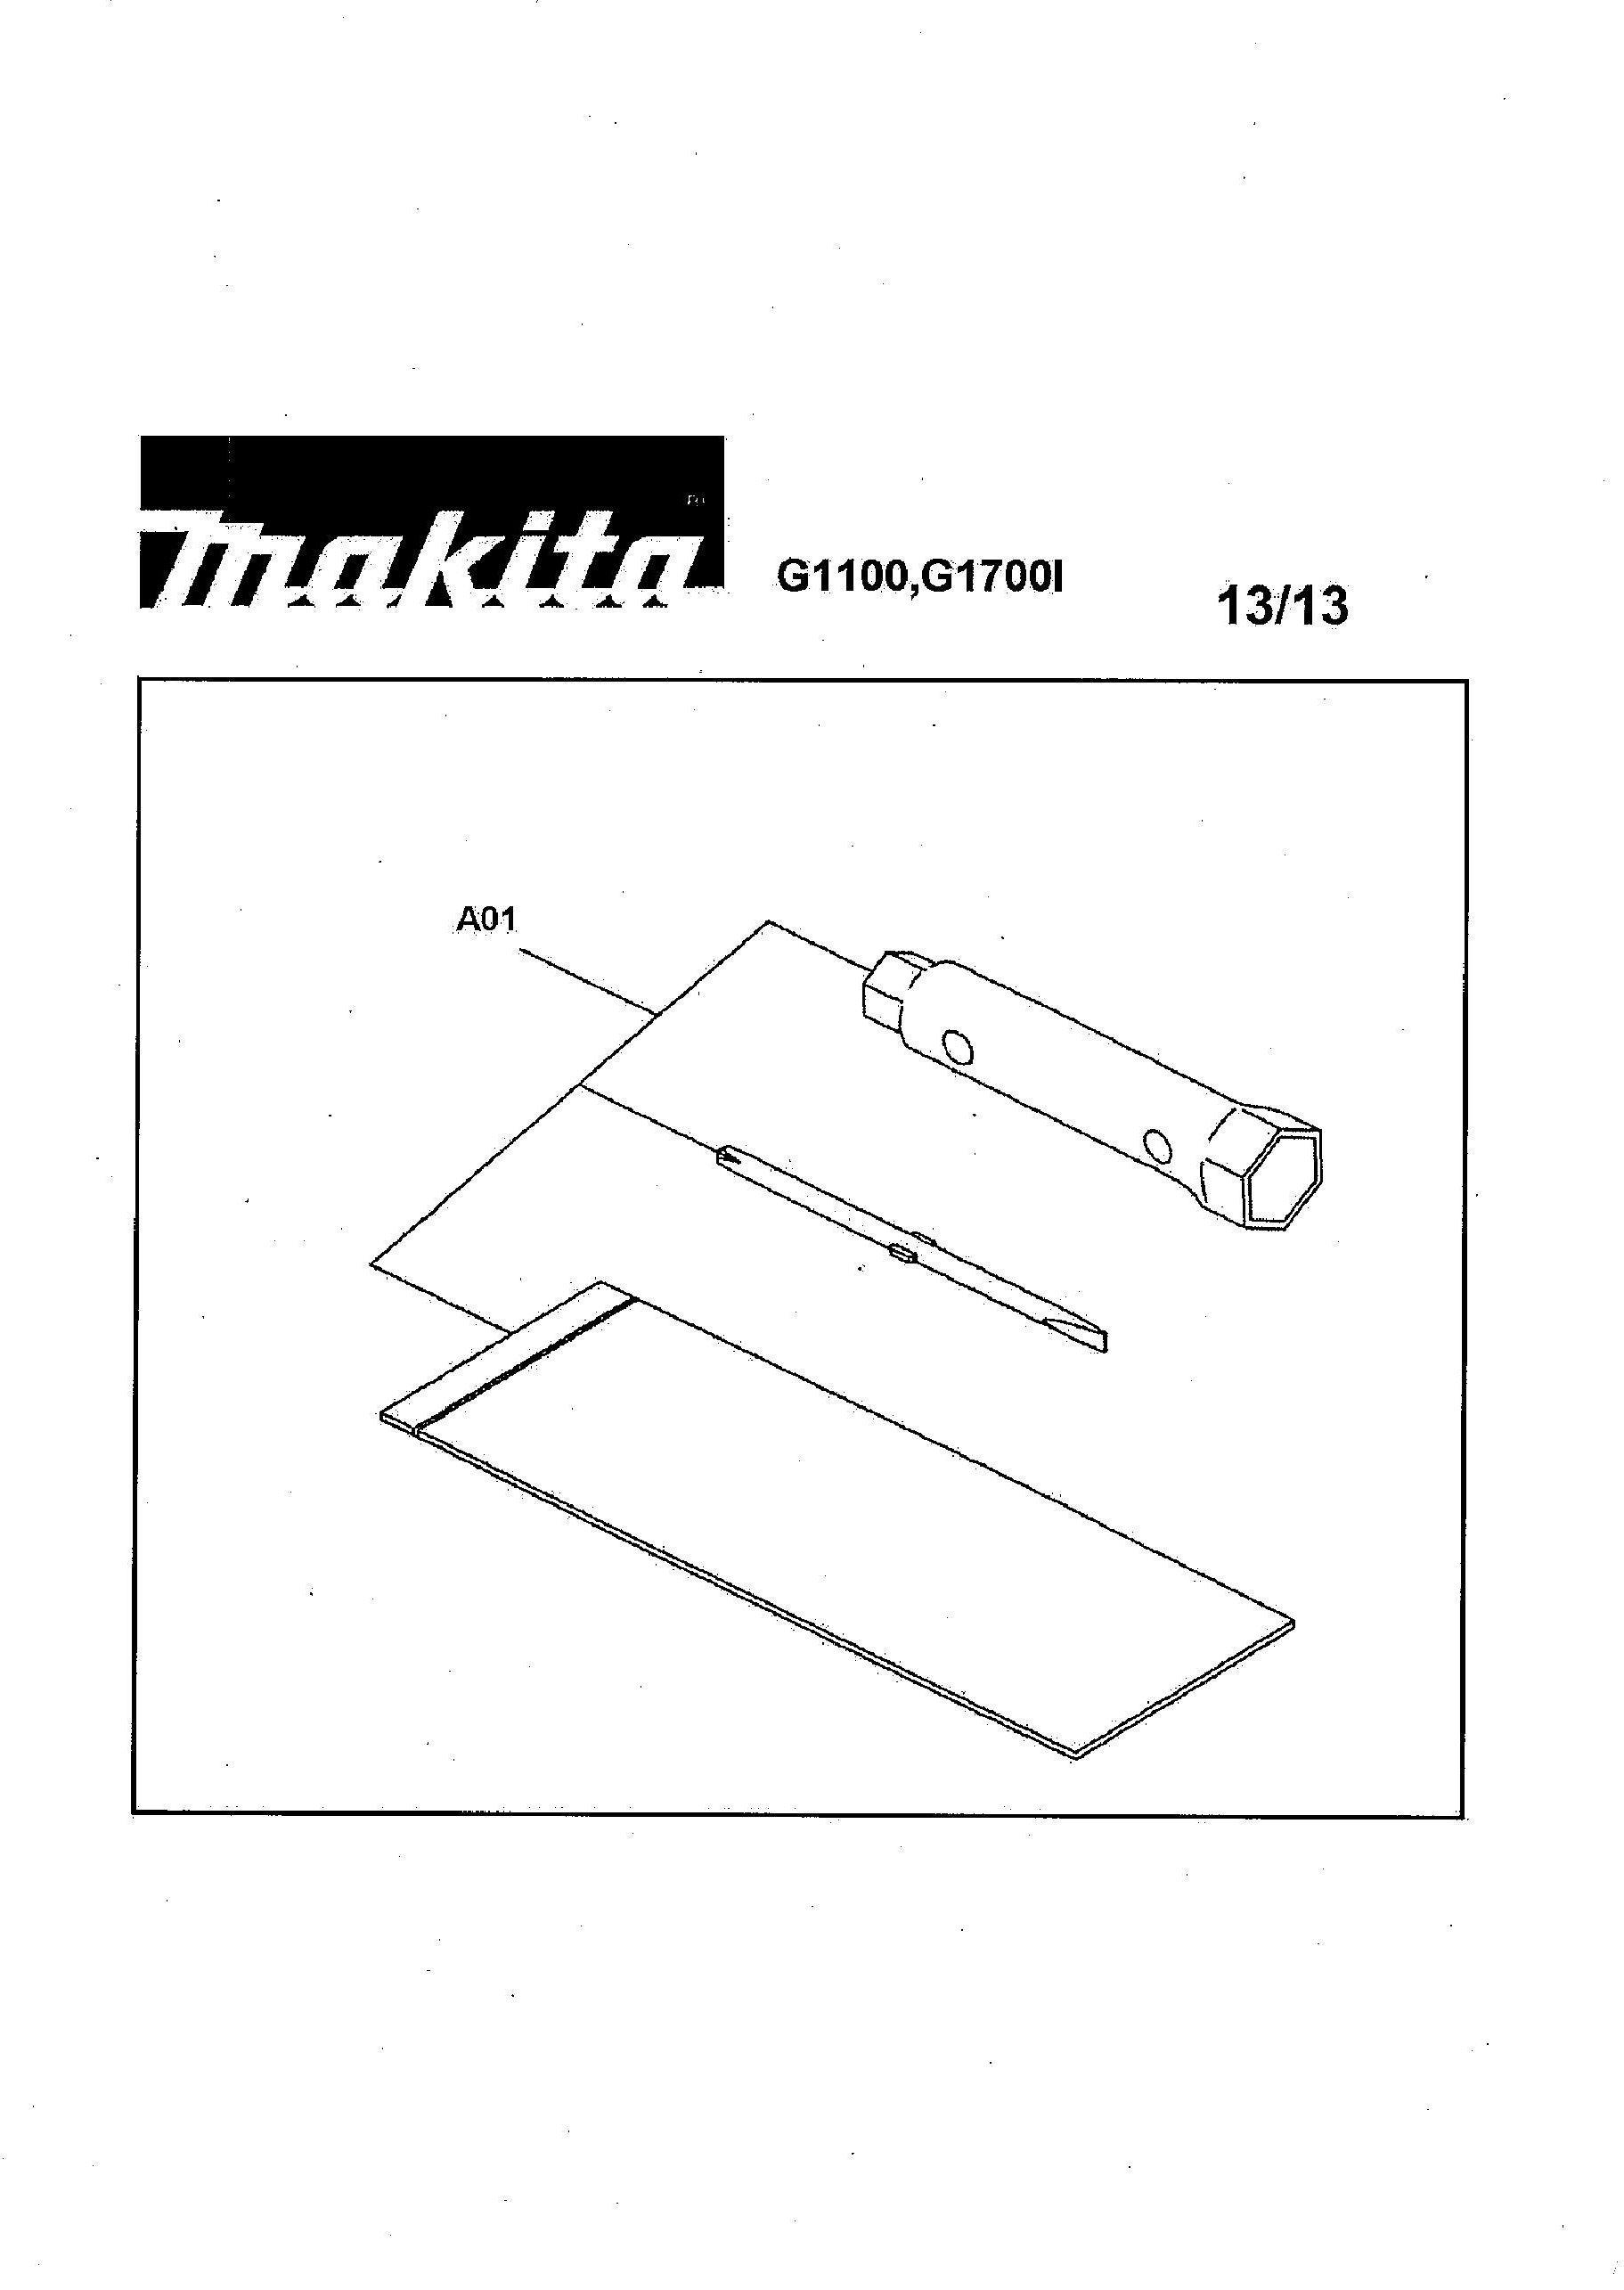 Spares for Makita G1700i SPARE_G1700I from Power Tool Centre